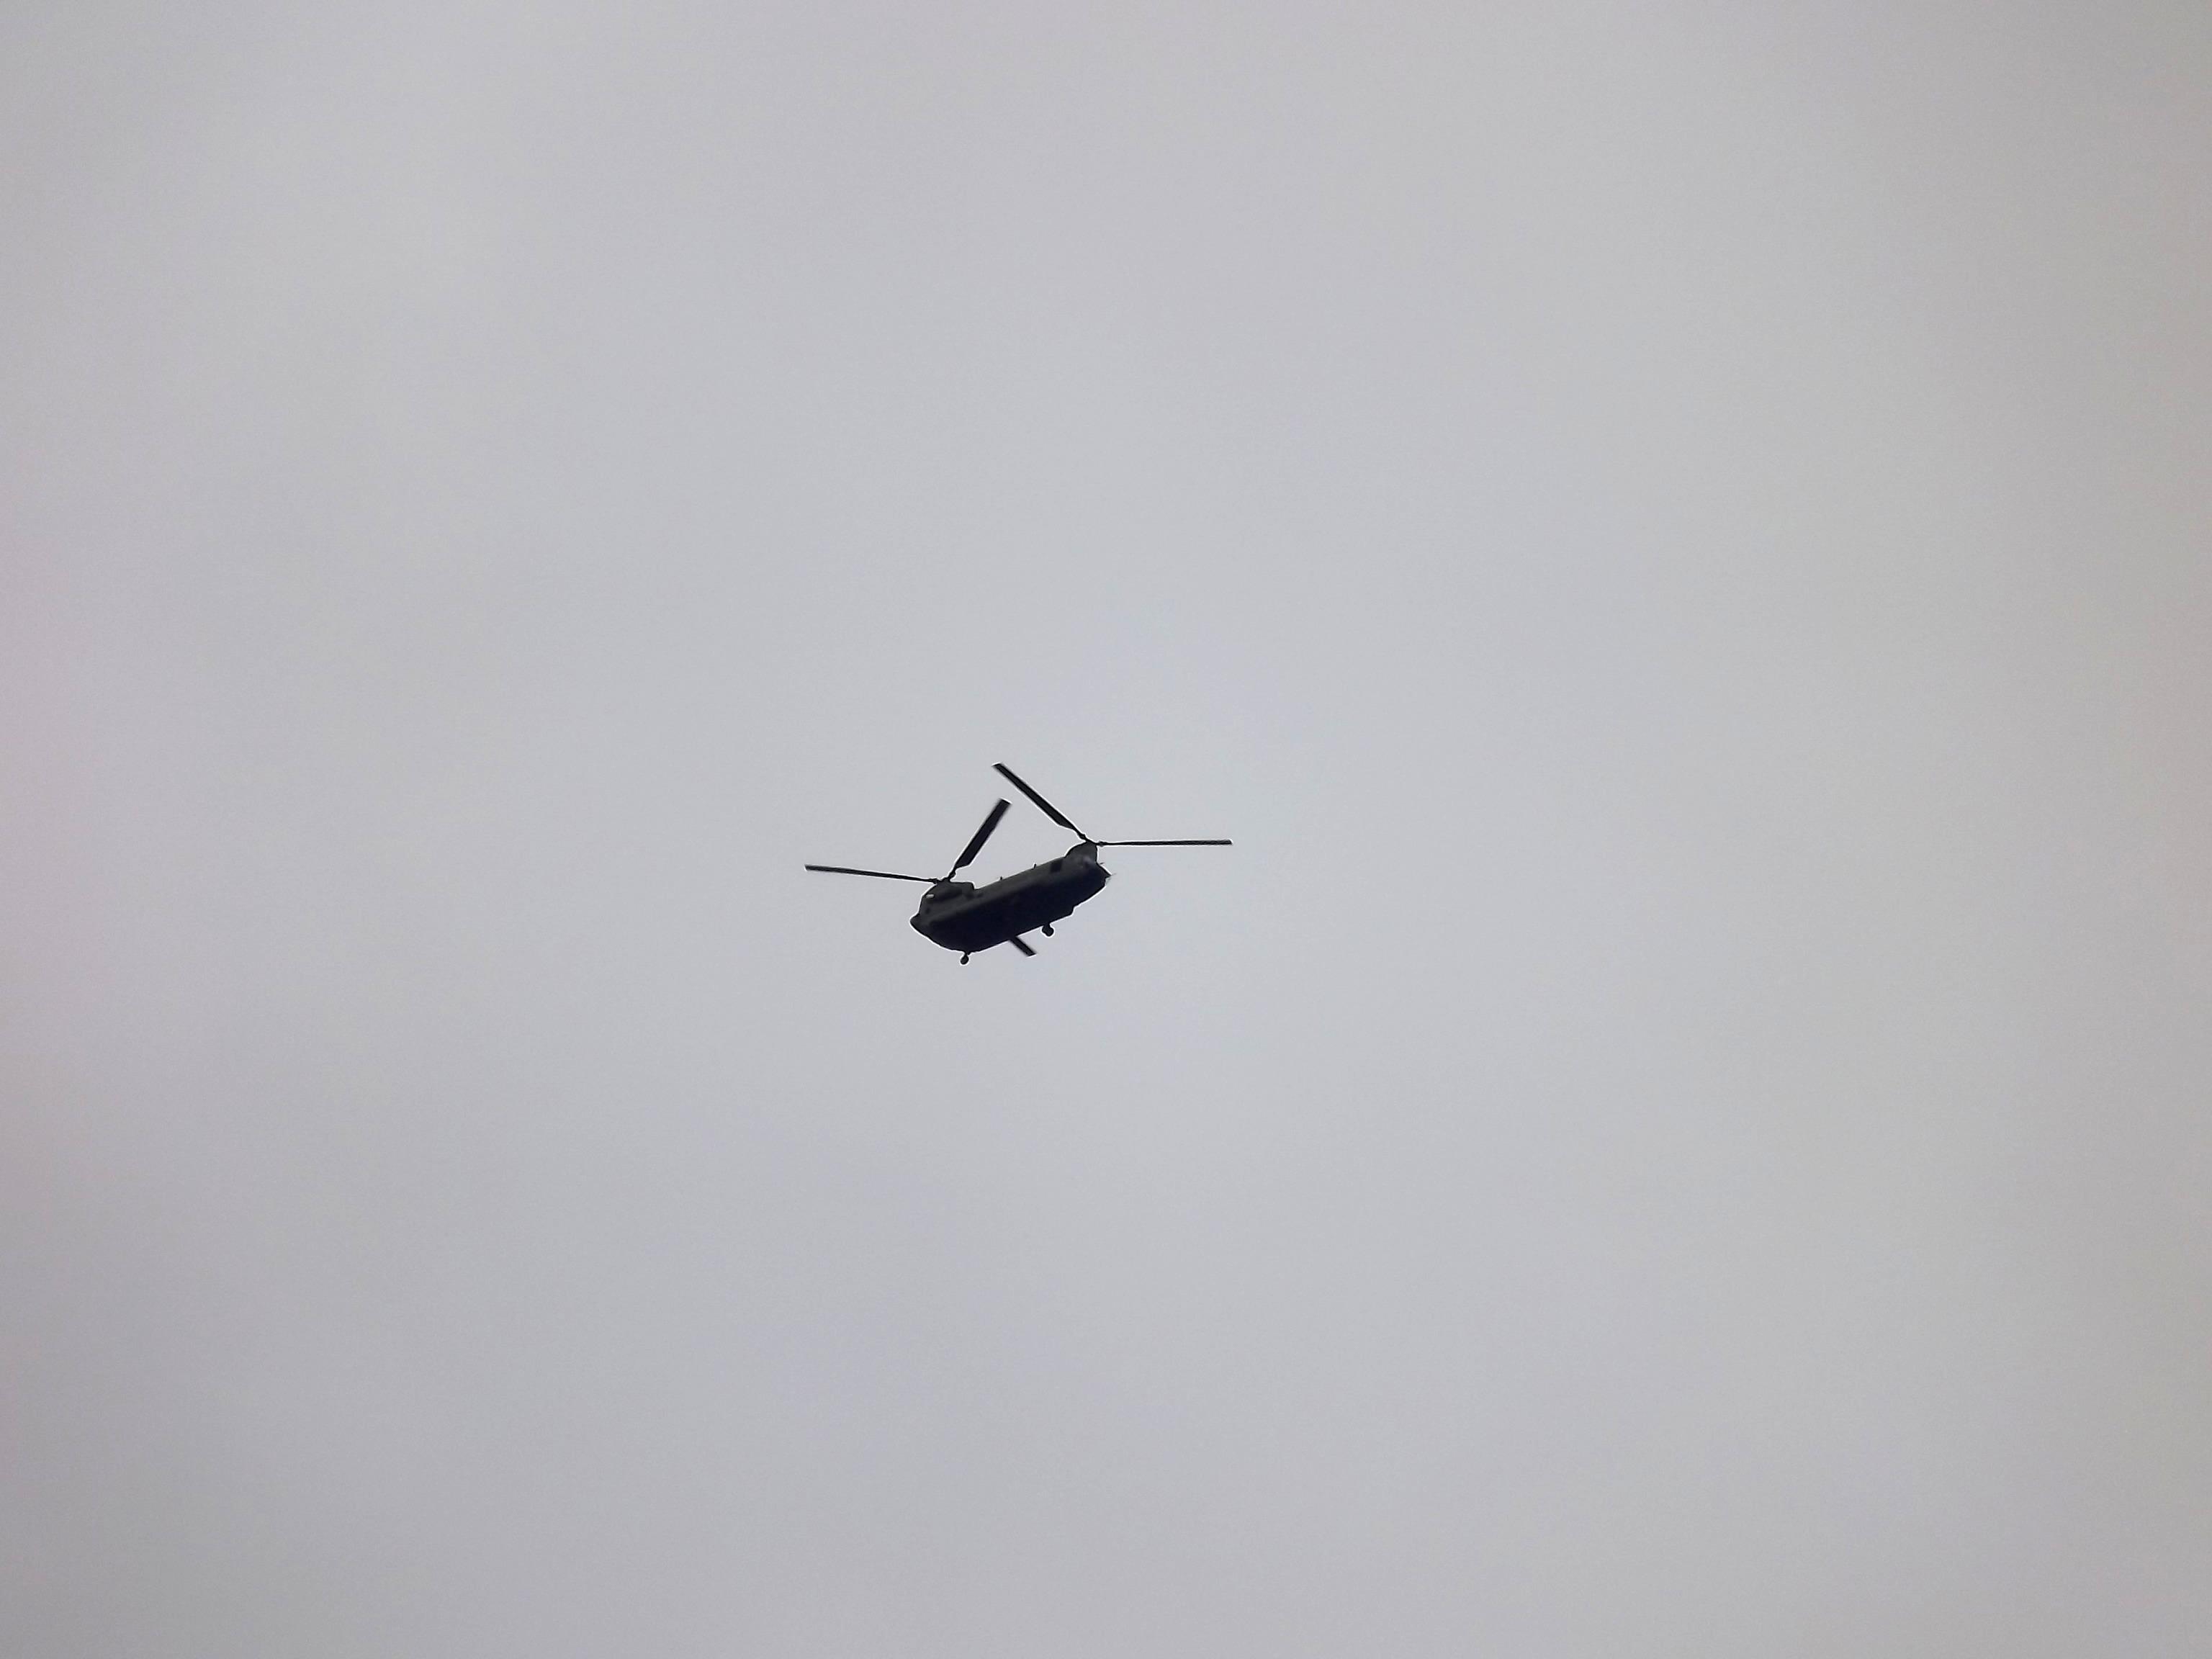 transporthubschrauber-ZA670-militaer-4241